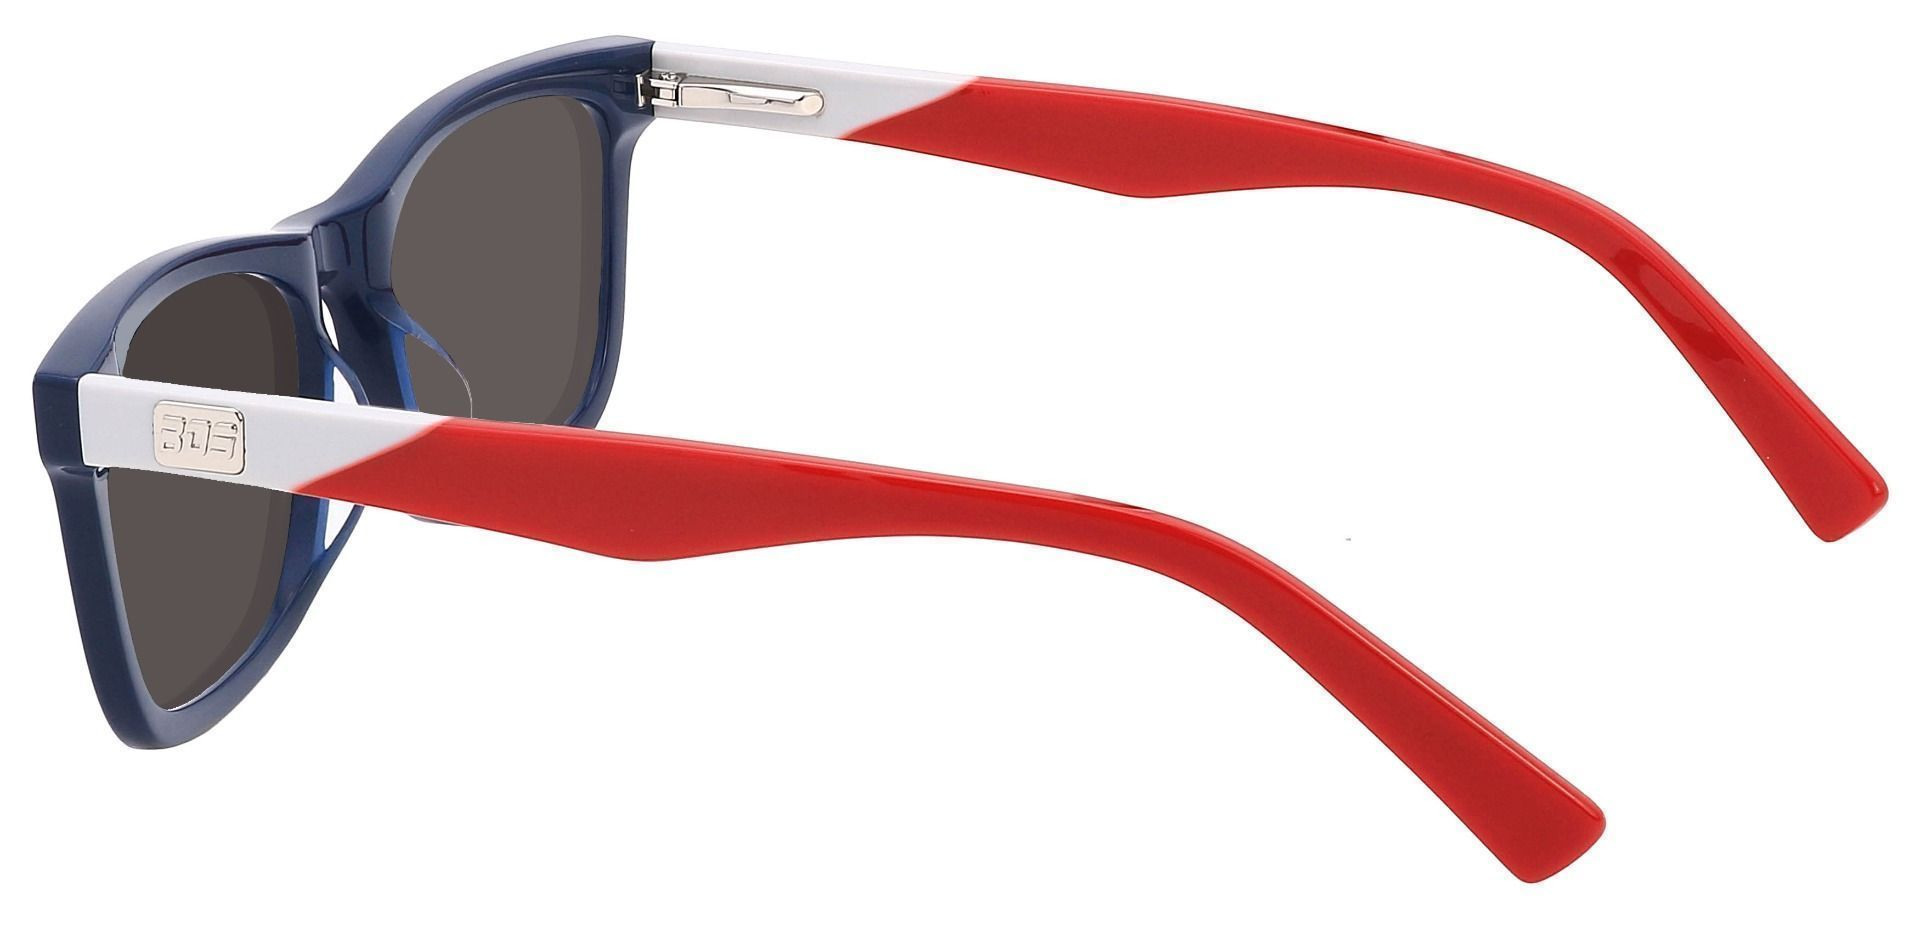 Newbury Rectangle Non-Rx Sunglasses - Blue Frame With Gray Lenses